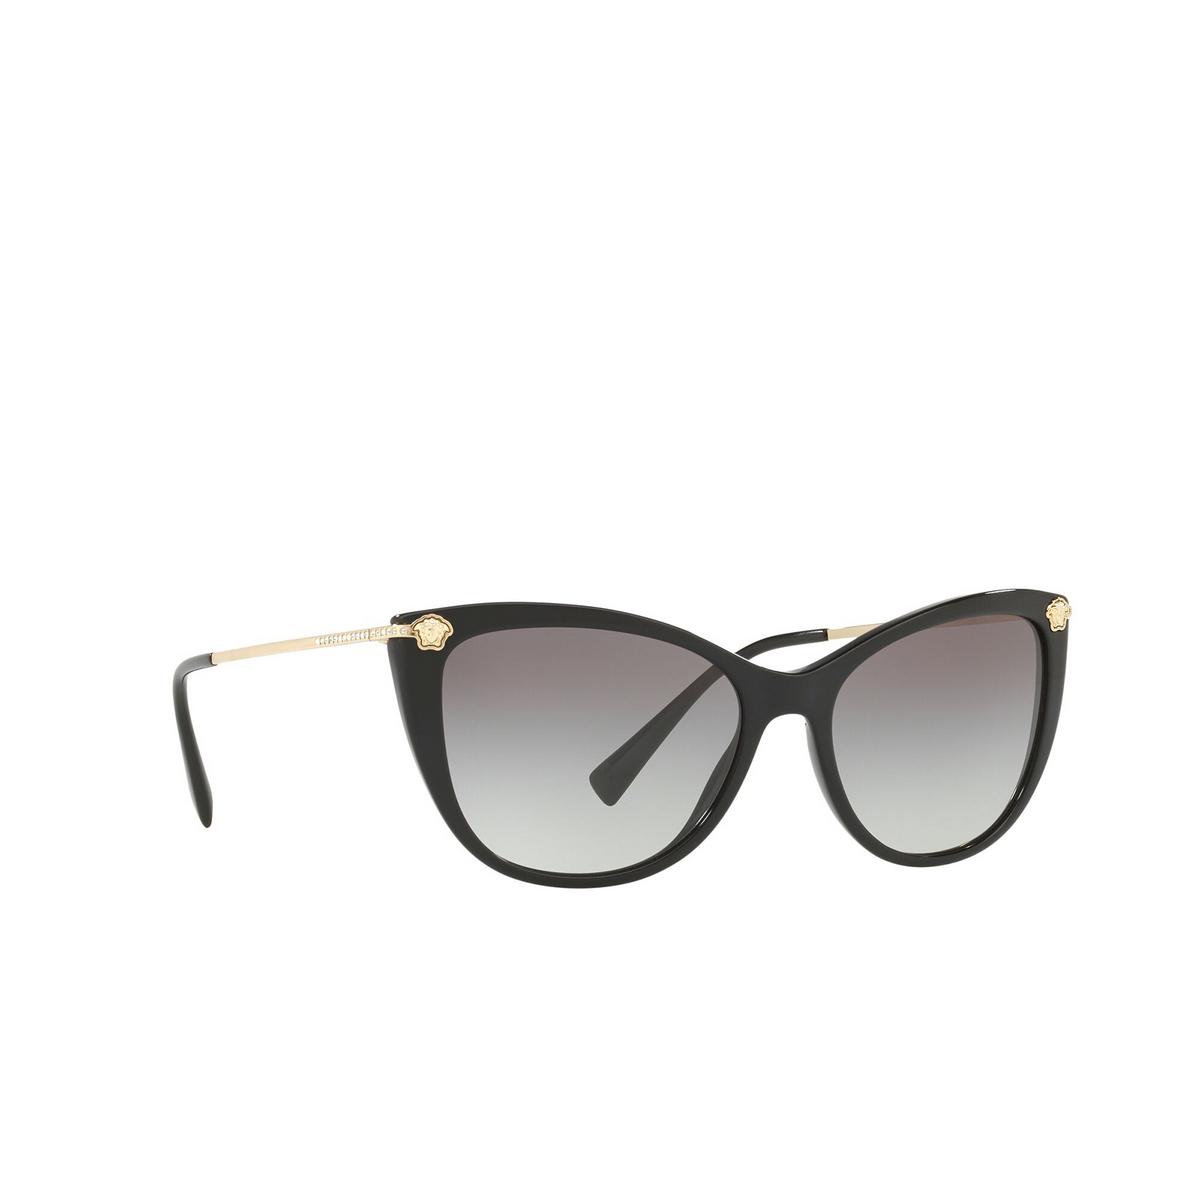 Versace® Cat-eye Sunglasses: VE4345B color Black GB1/11 - three-quarters view.